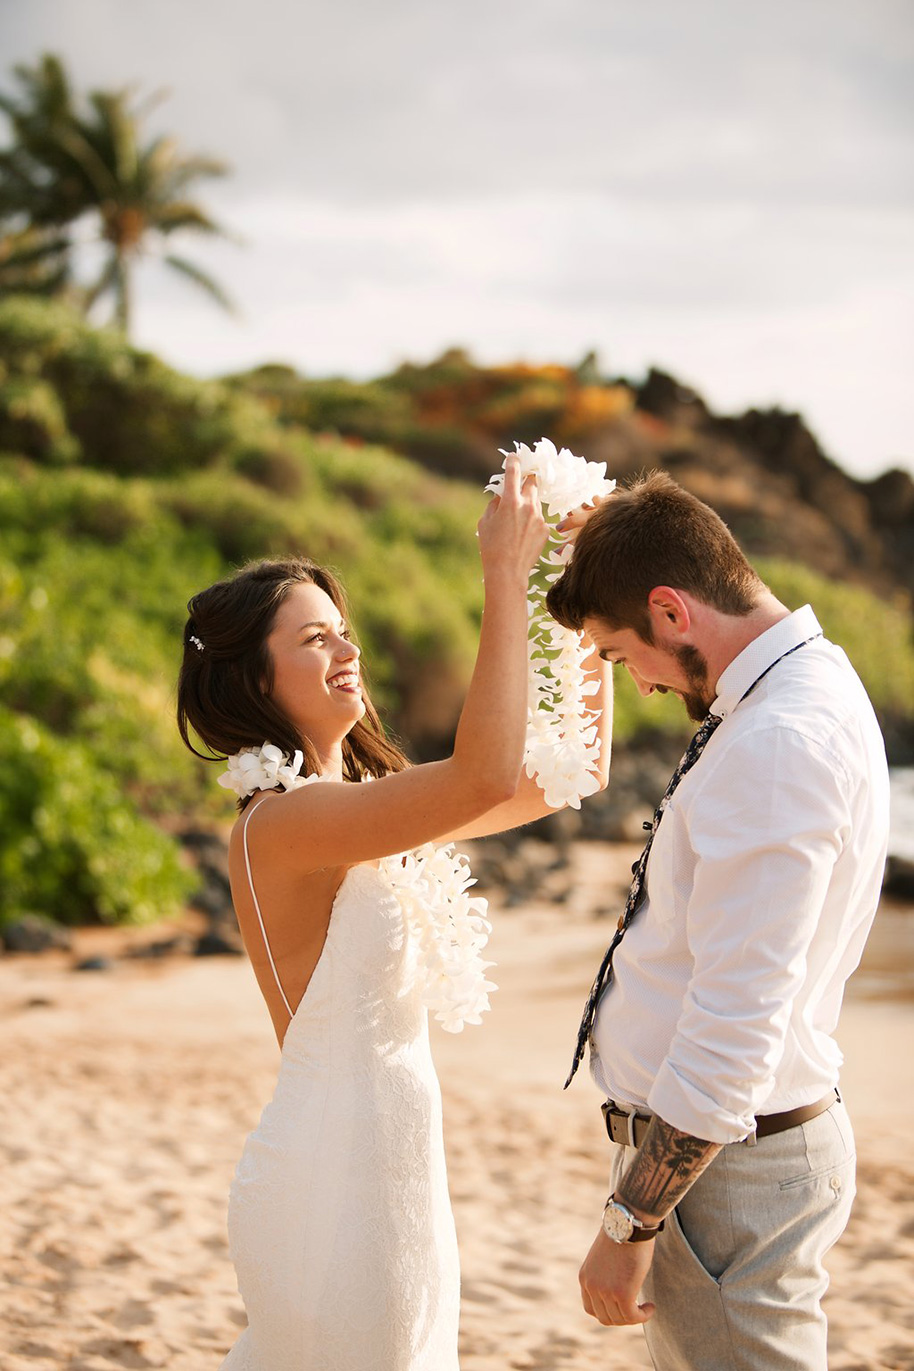 Maui-Beach-Wedding-070616-6